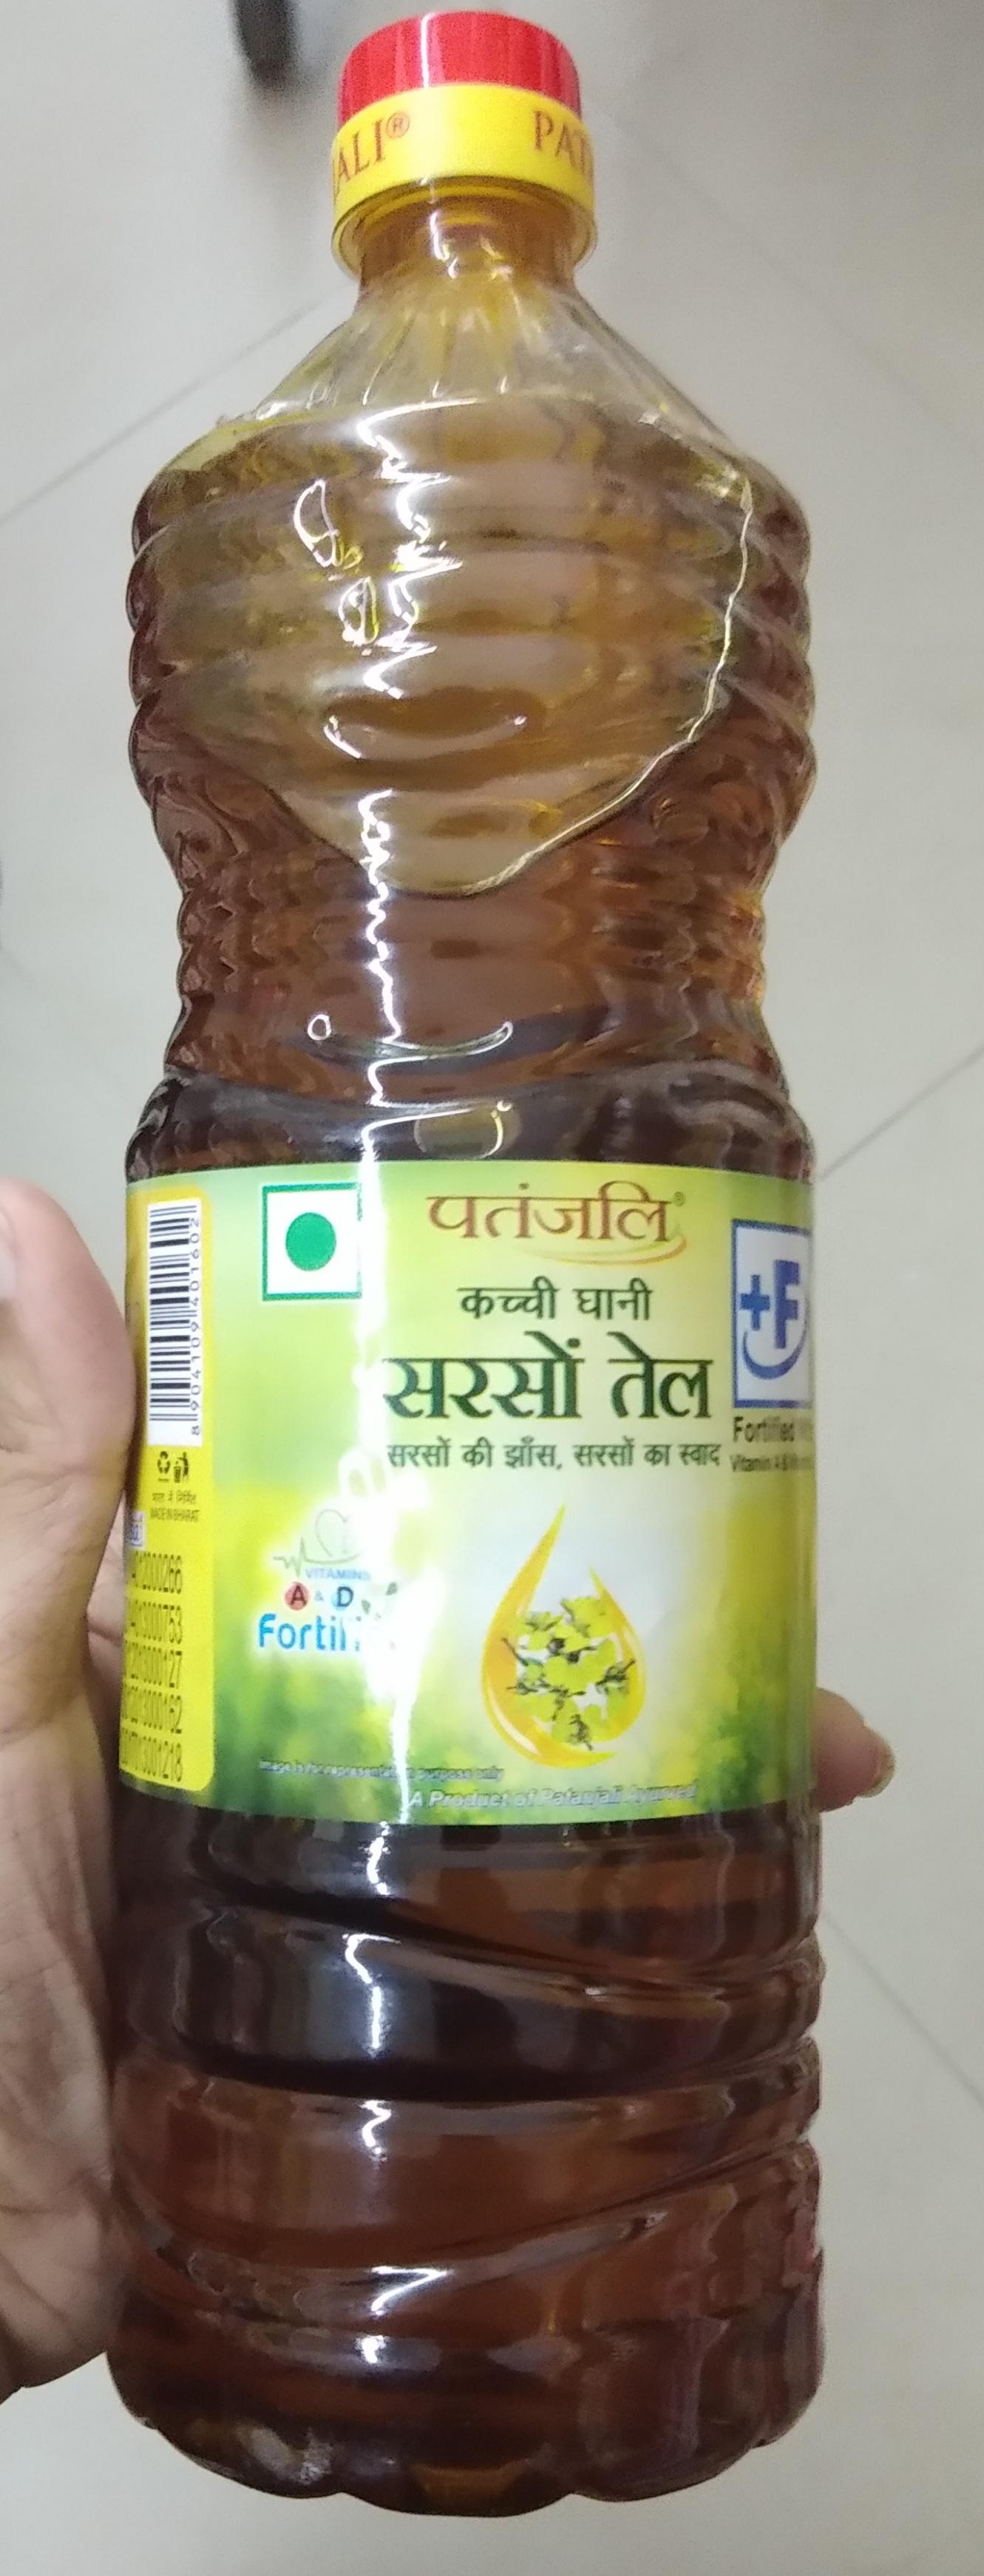 Patanjali Kachi Ghani Mustard Oil-Beneficial-By Nasreen-1